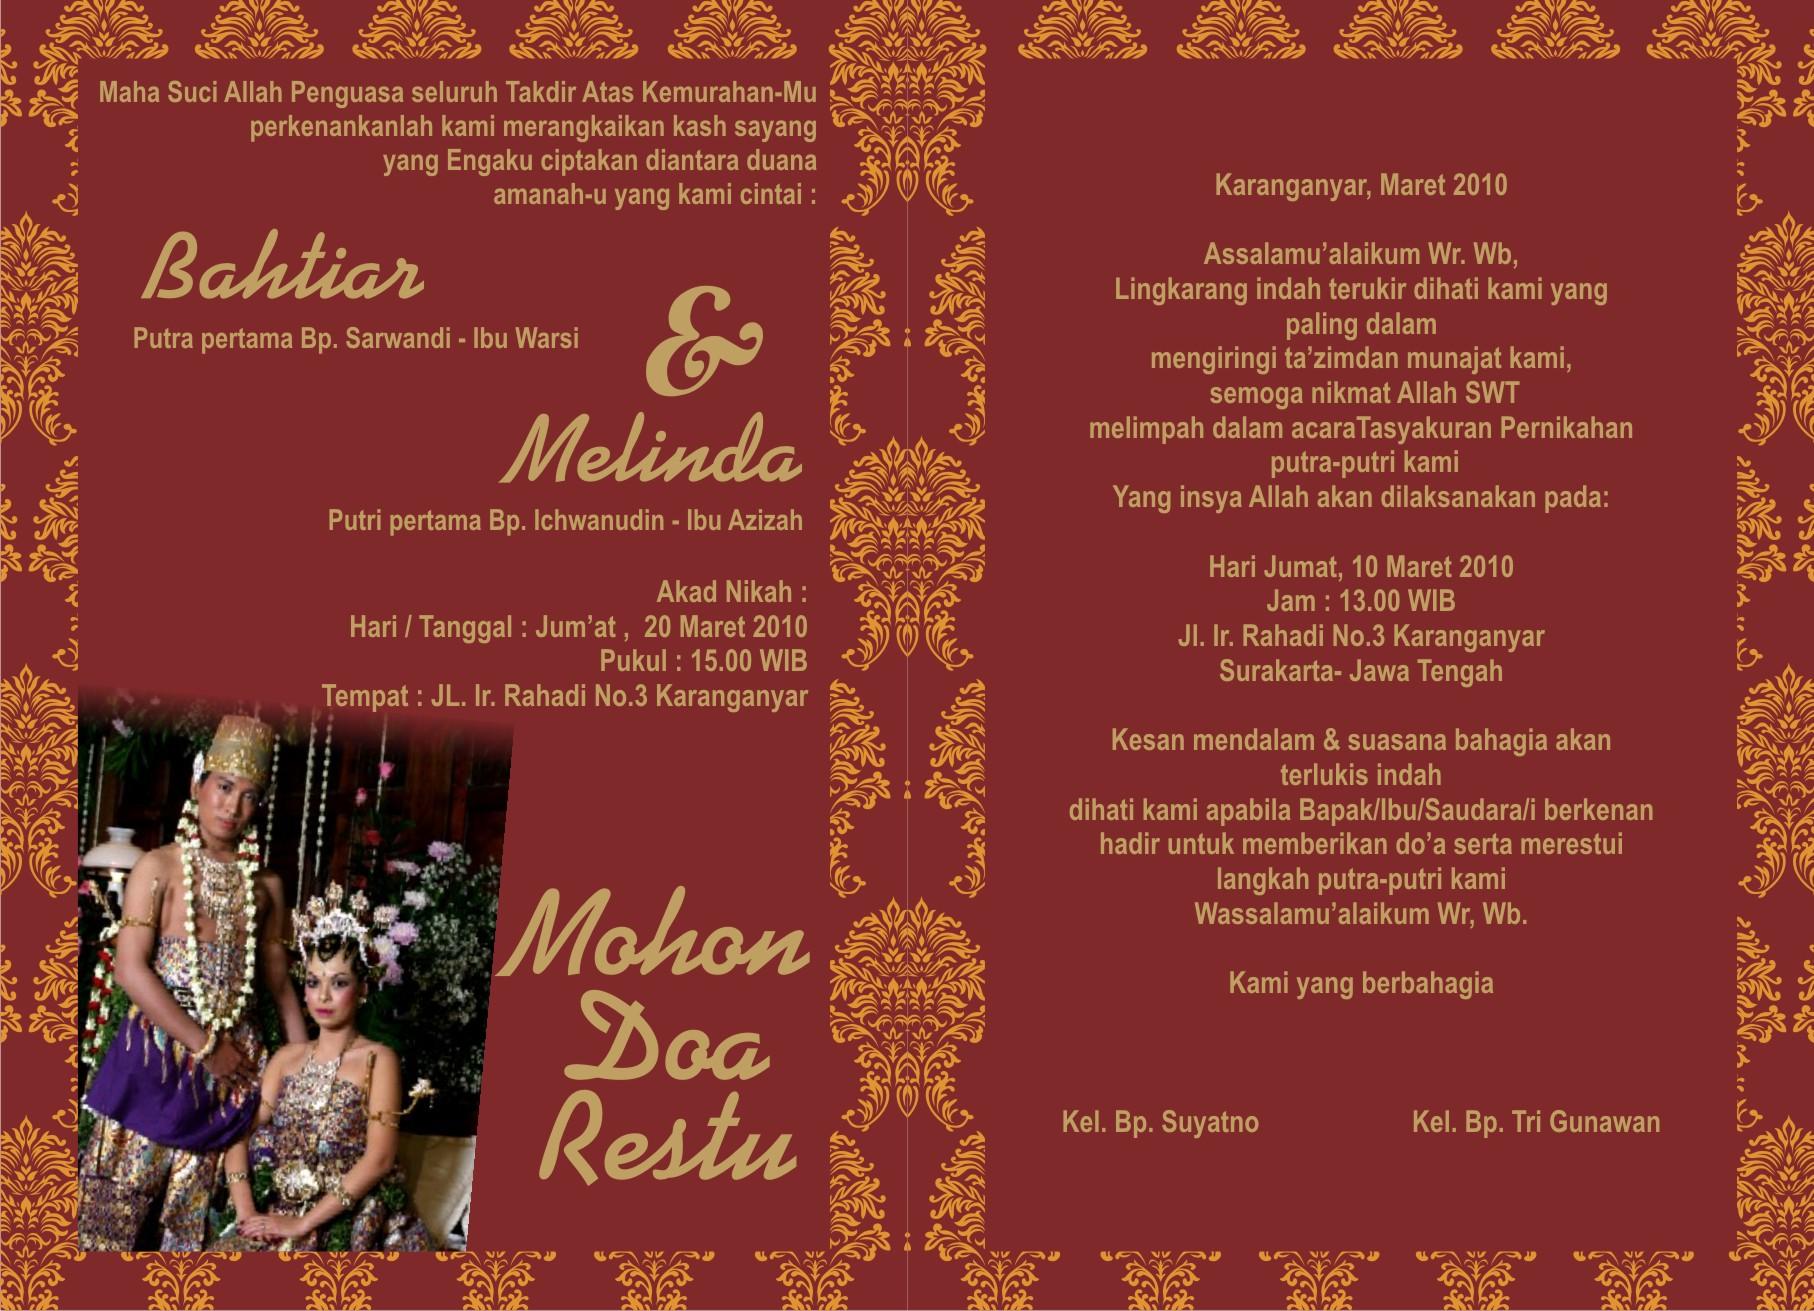 undangan pernikahan bahasa jawa krama alus